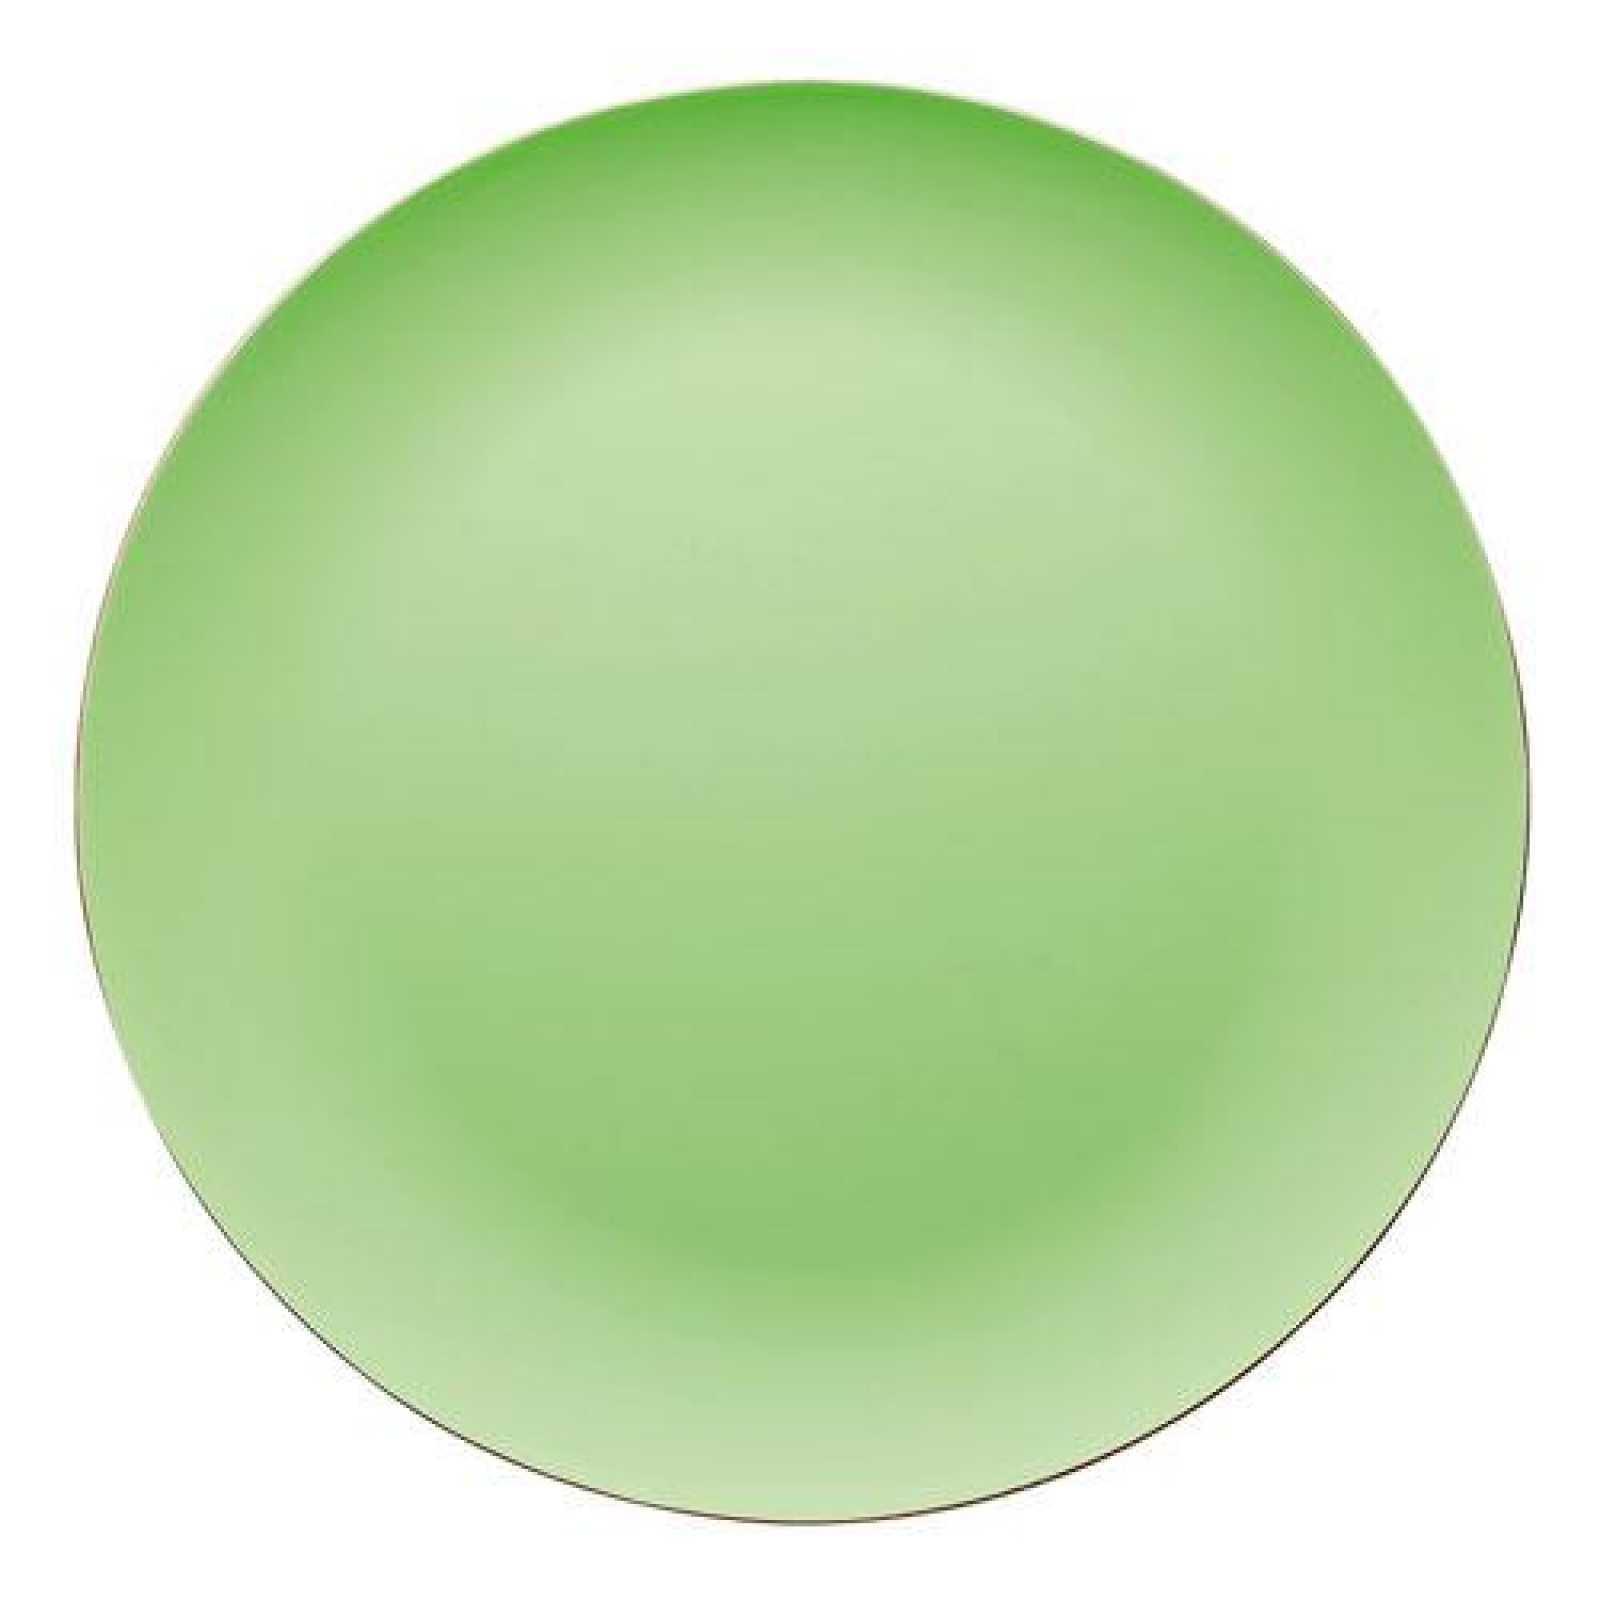 Онлайн каталог PROMENU: Поднос деревянный Rosenthal SUNNY DAY, диаметр 41 см, зеленый Rosenthal 69763-408527-05642